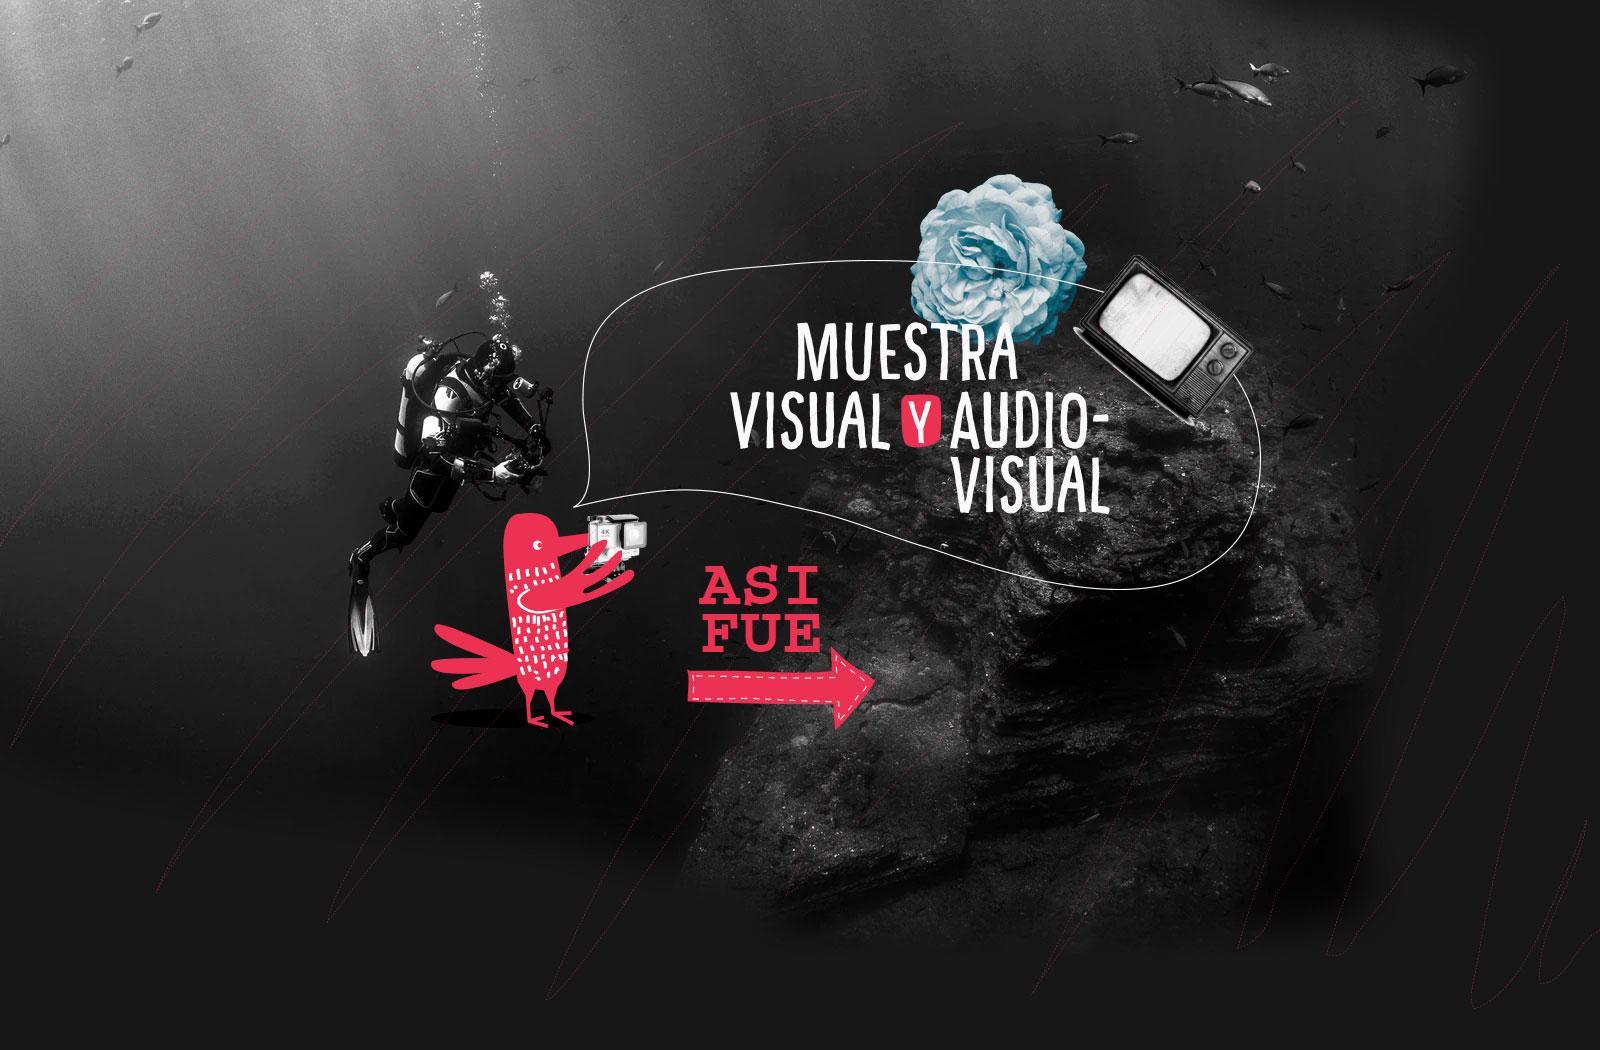 Muestra visual y Audiovisual 2016